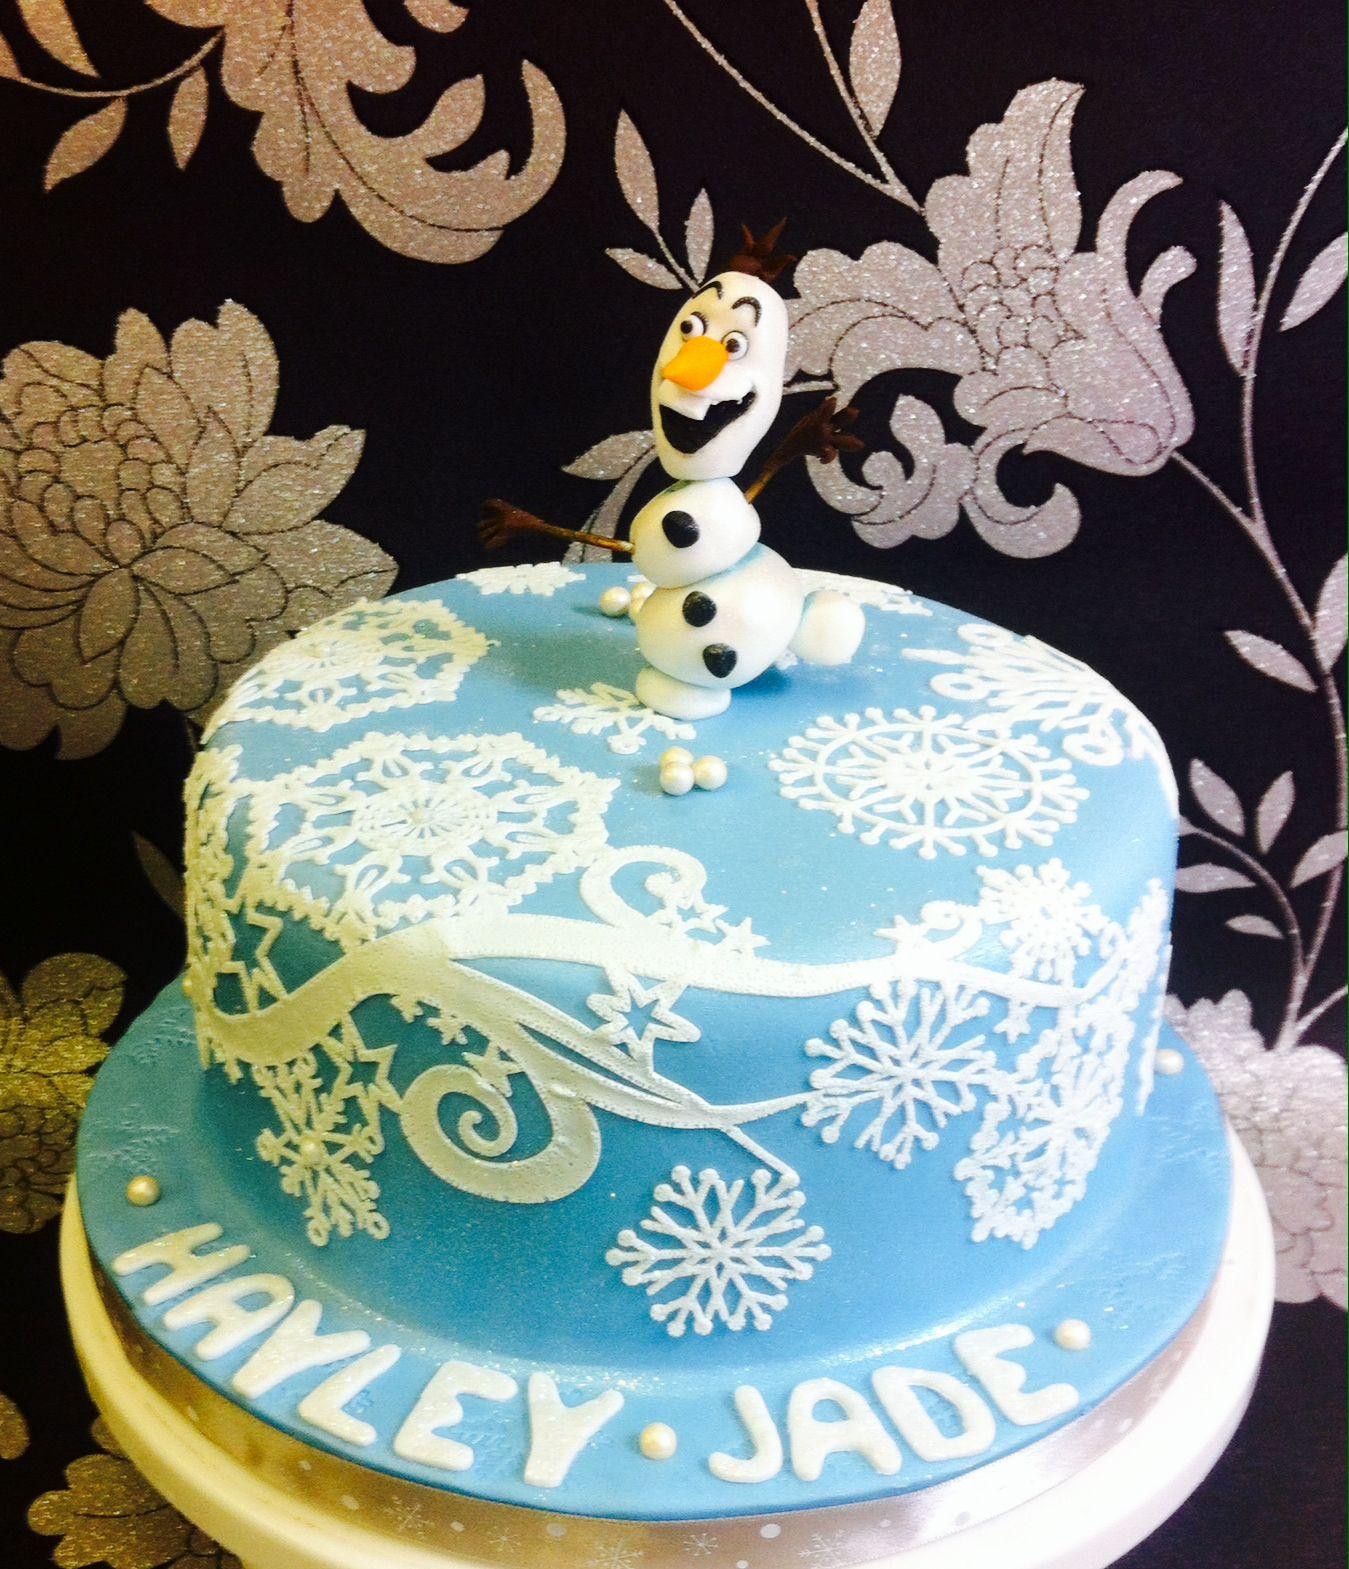 Frozen cake design images  Frozen  Olaf cake  bellas birthday cake ideas  Pinterest  Olaf